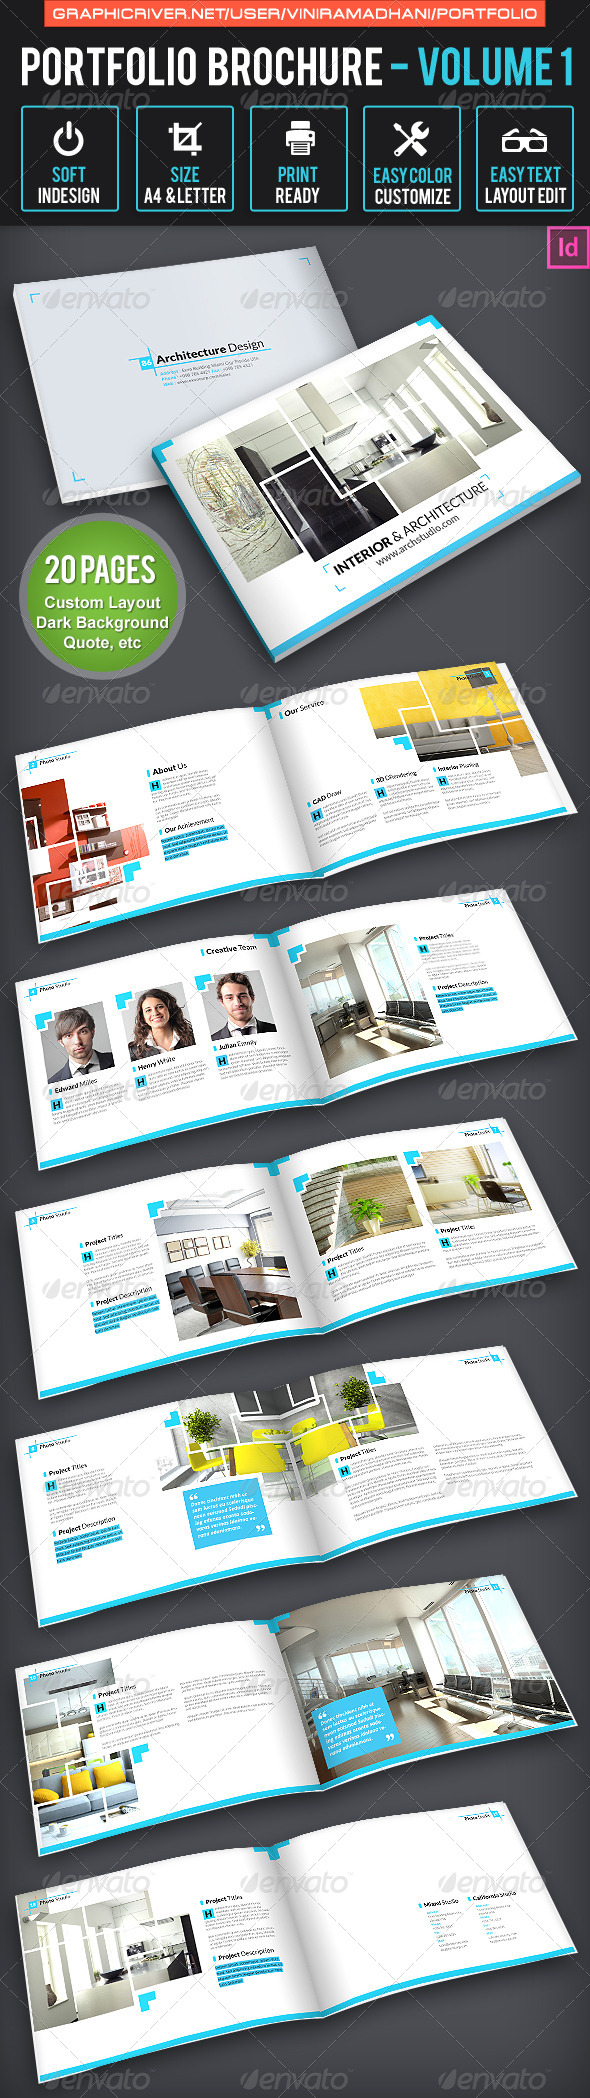 Portfolio Brochure Volume 1 - Corporate Brochures